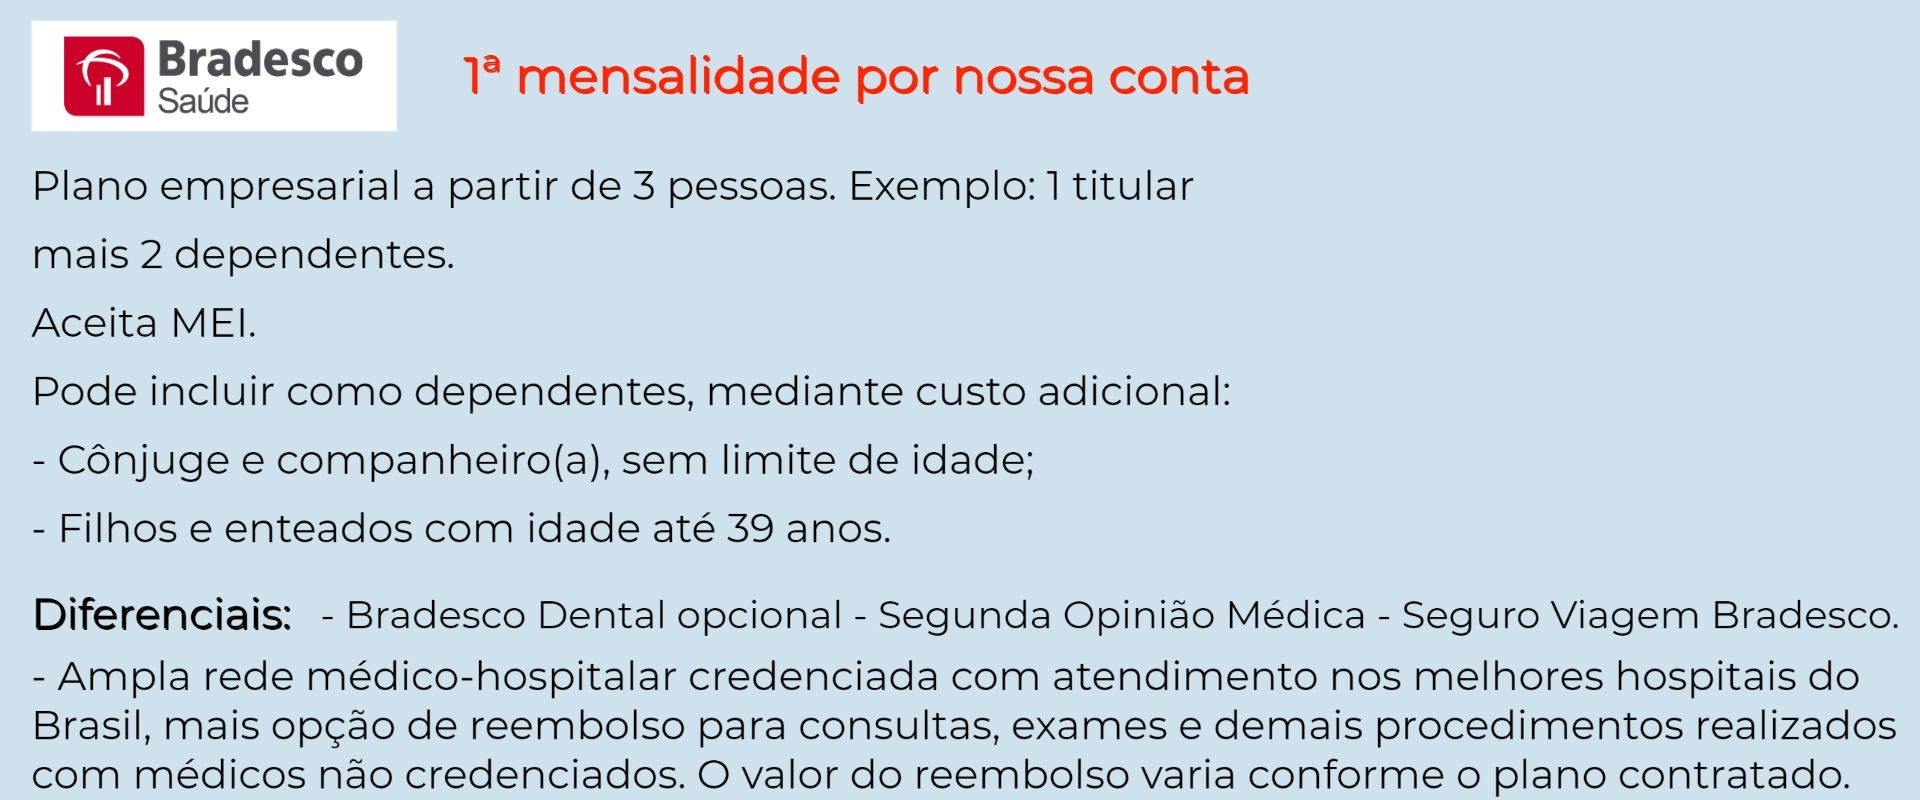 Bradesco Saúde Empresarial -  Nerópolis